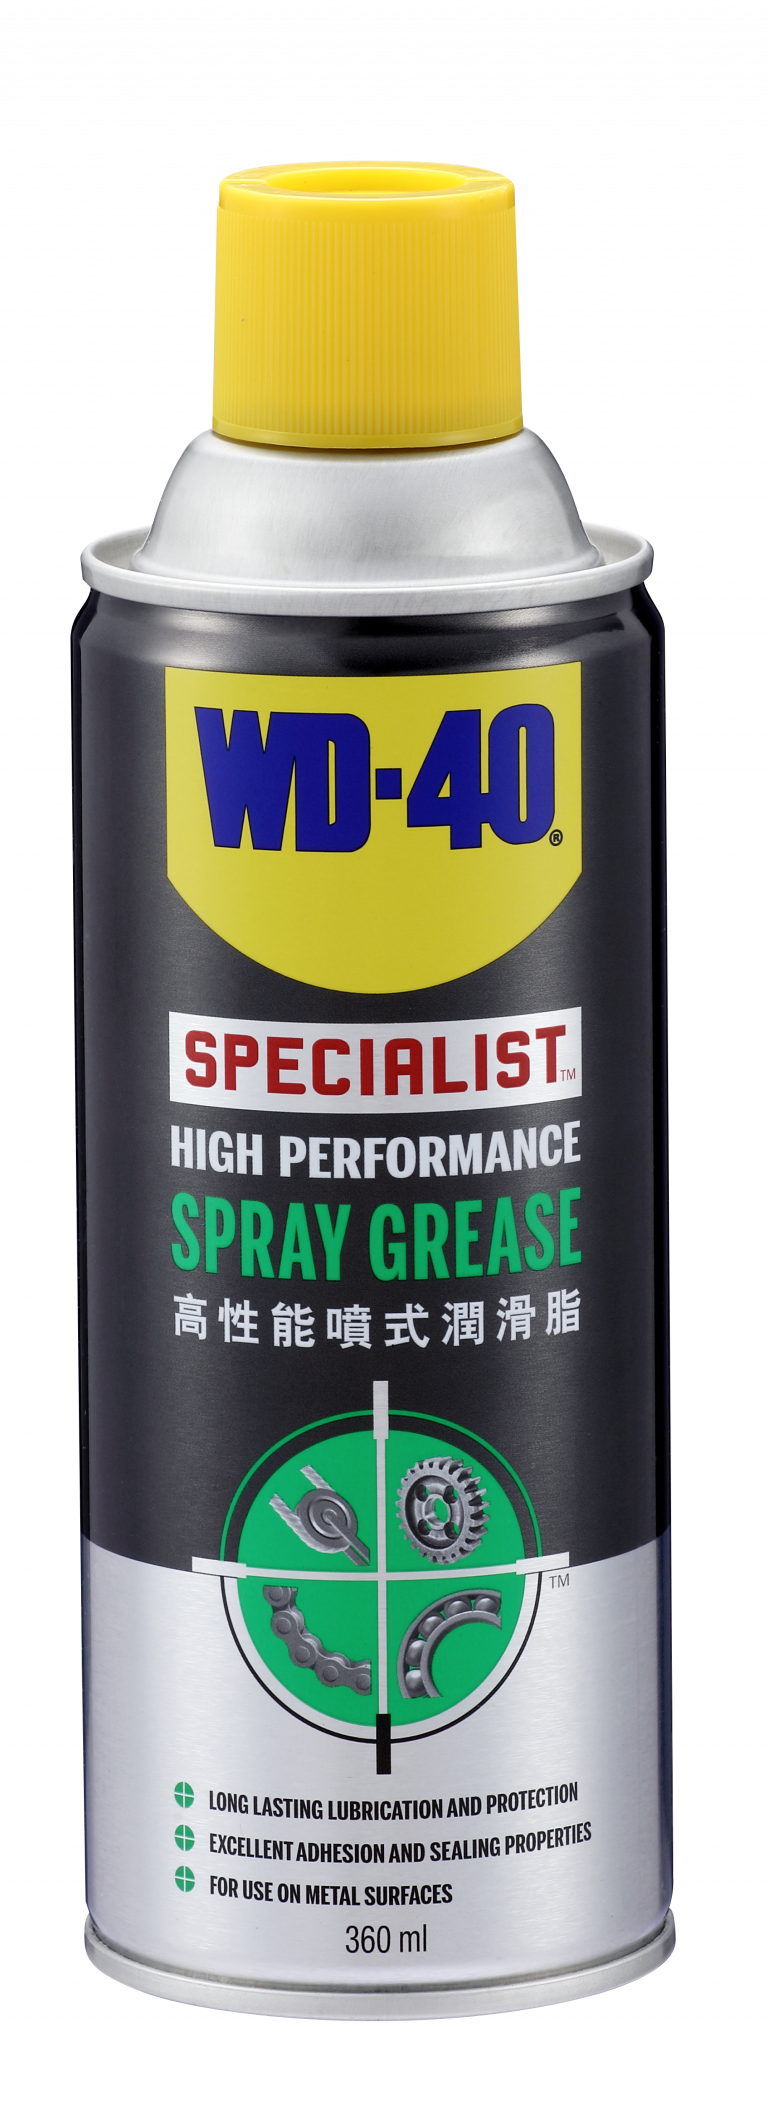 industrial_-spraygreaser-e1557844979412-768x2108